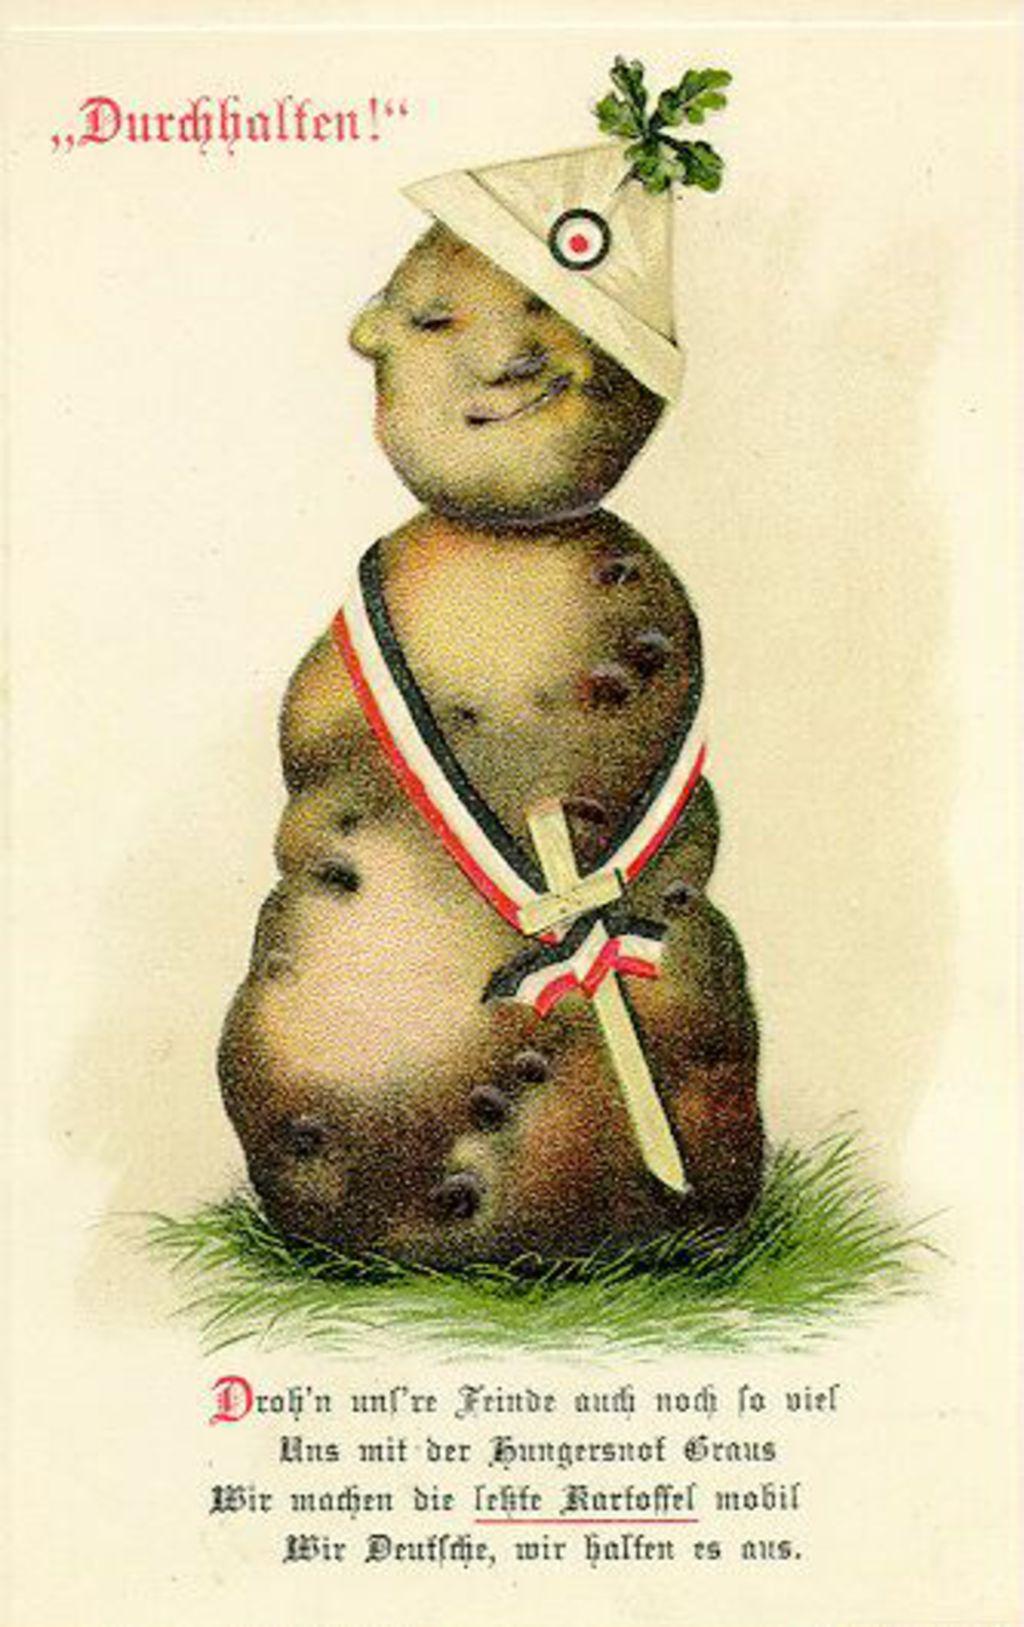 """Durchhaltenl""(耐えぬけ!)と書かれた第一次世界大戦中のドイツのプロパガンダ用のポスター。ジャガイモが兵士のように描かれている。"